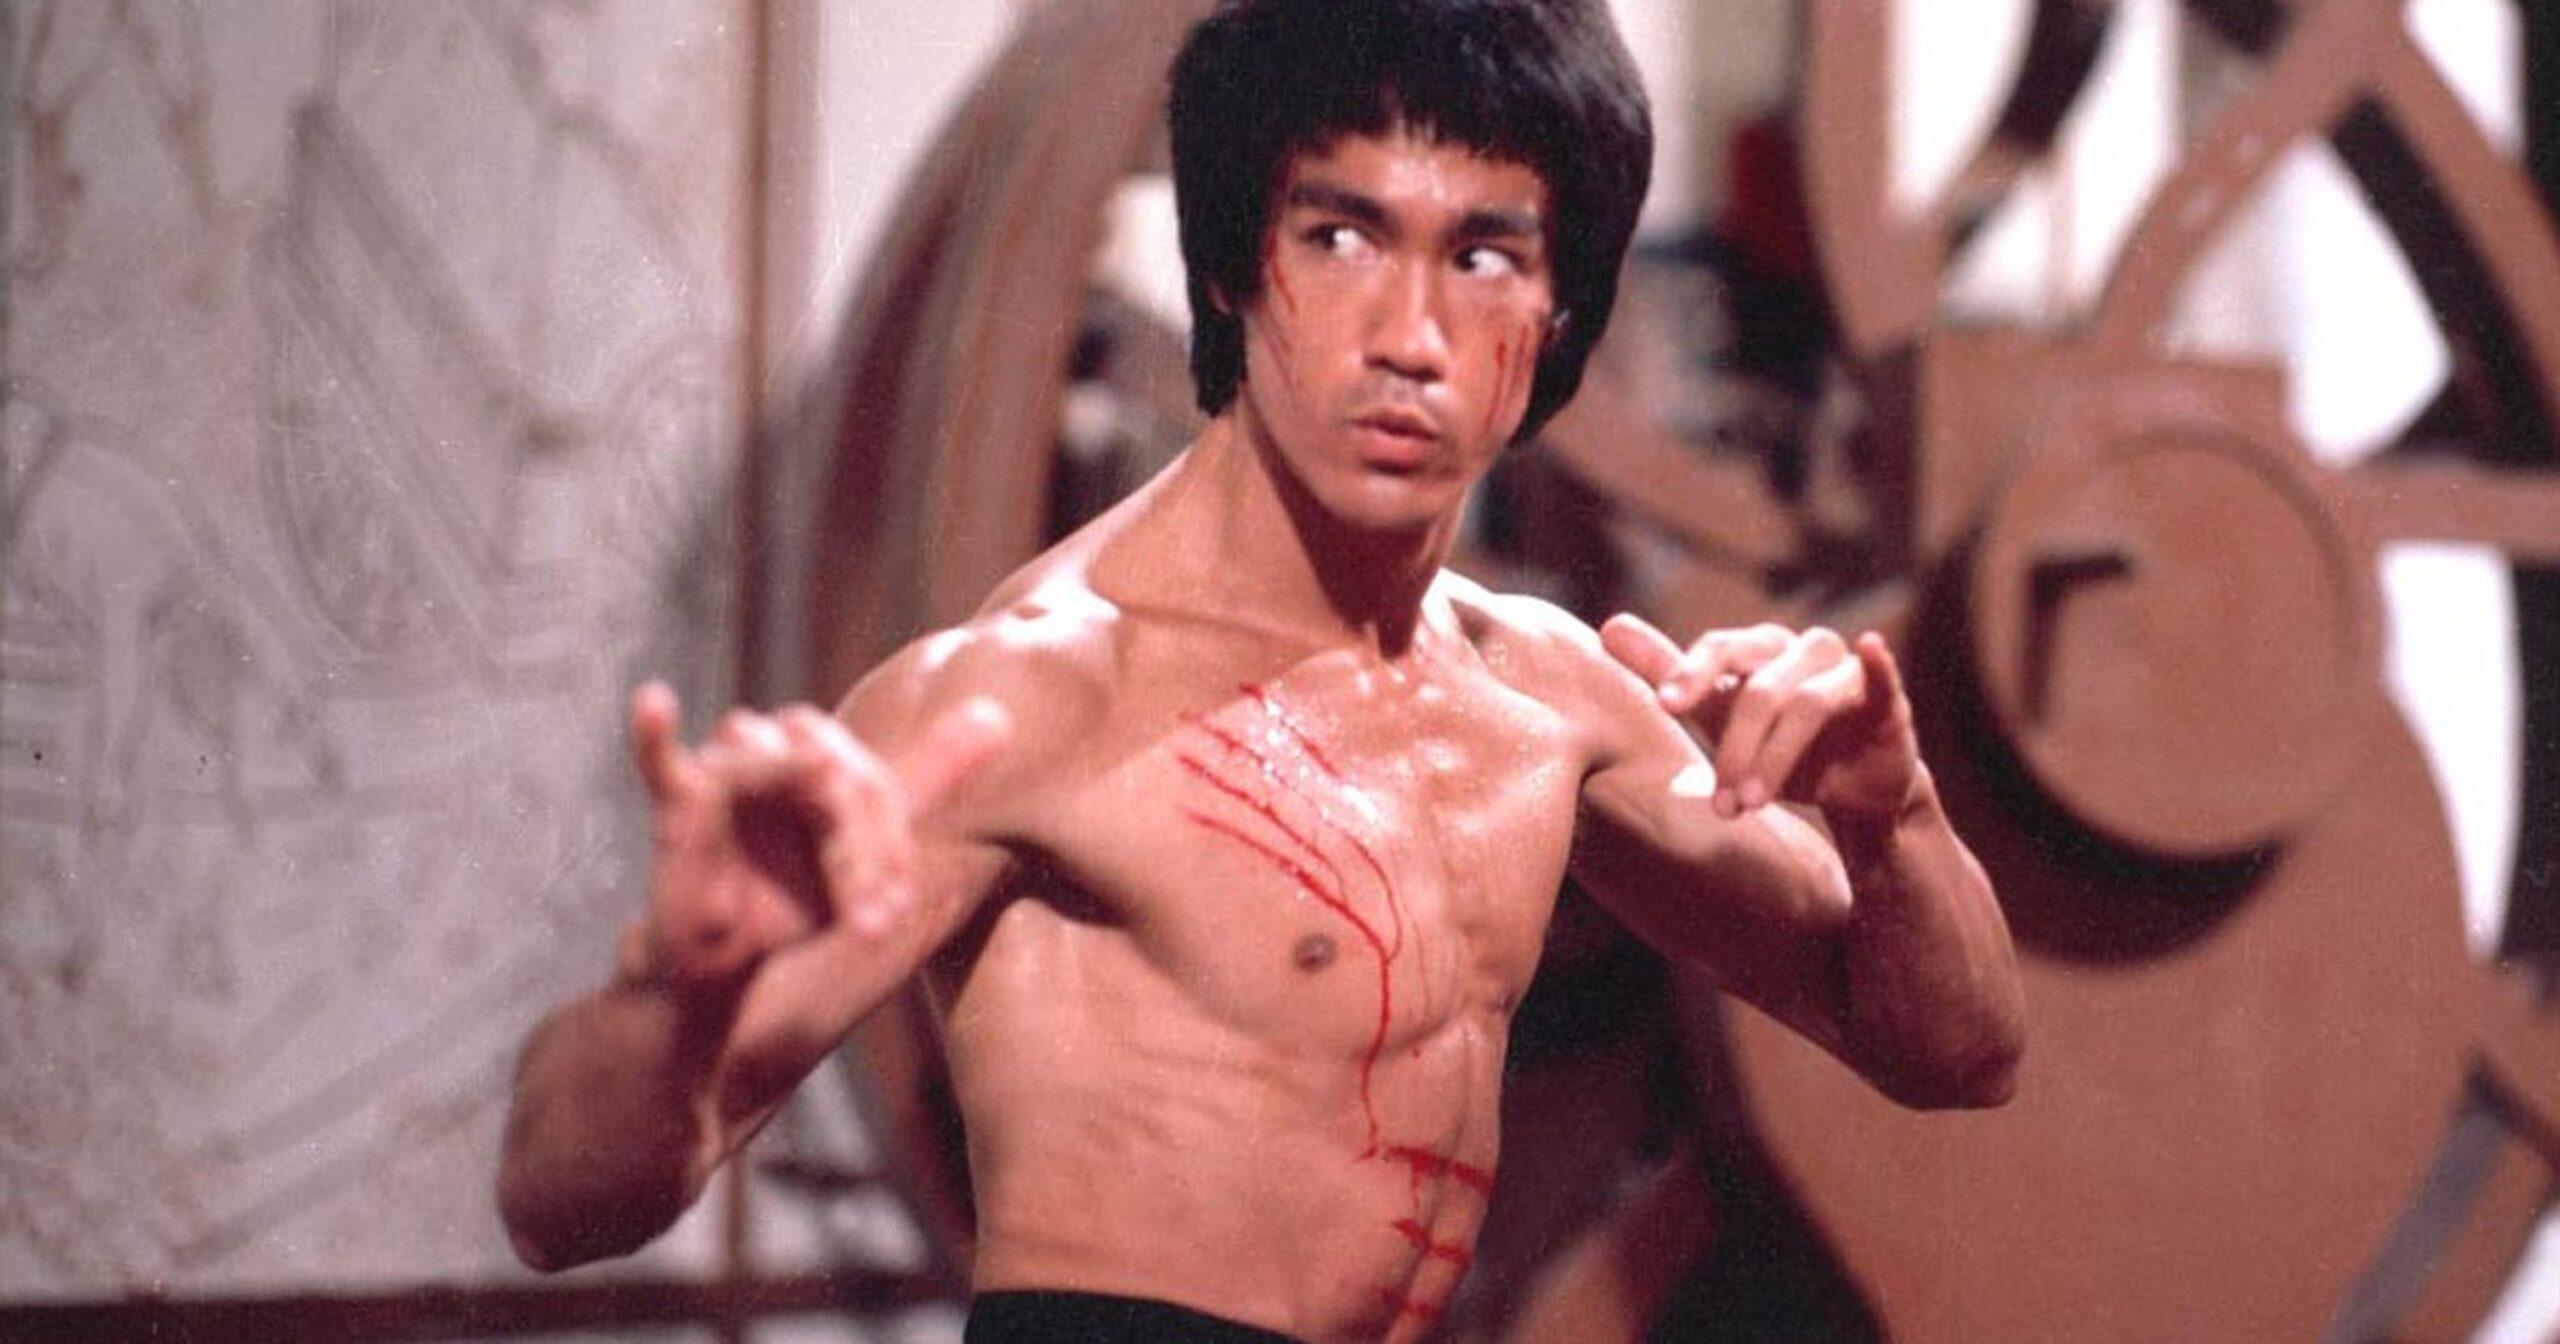 Bruce Lee networkokulu.net motivasyon sözleri 7